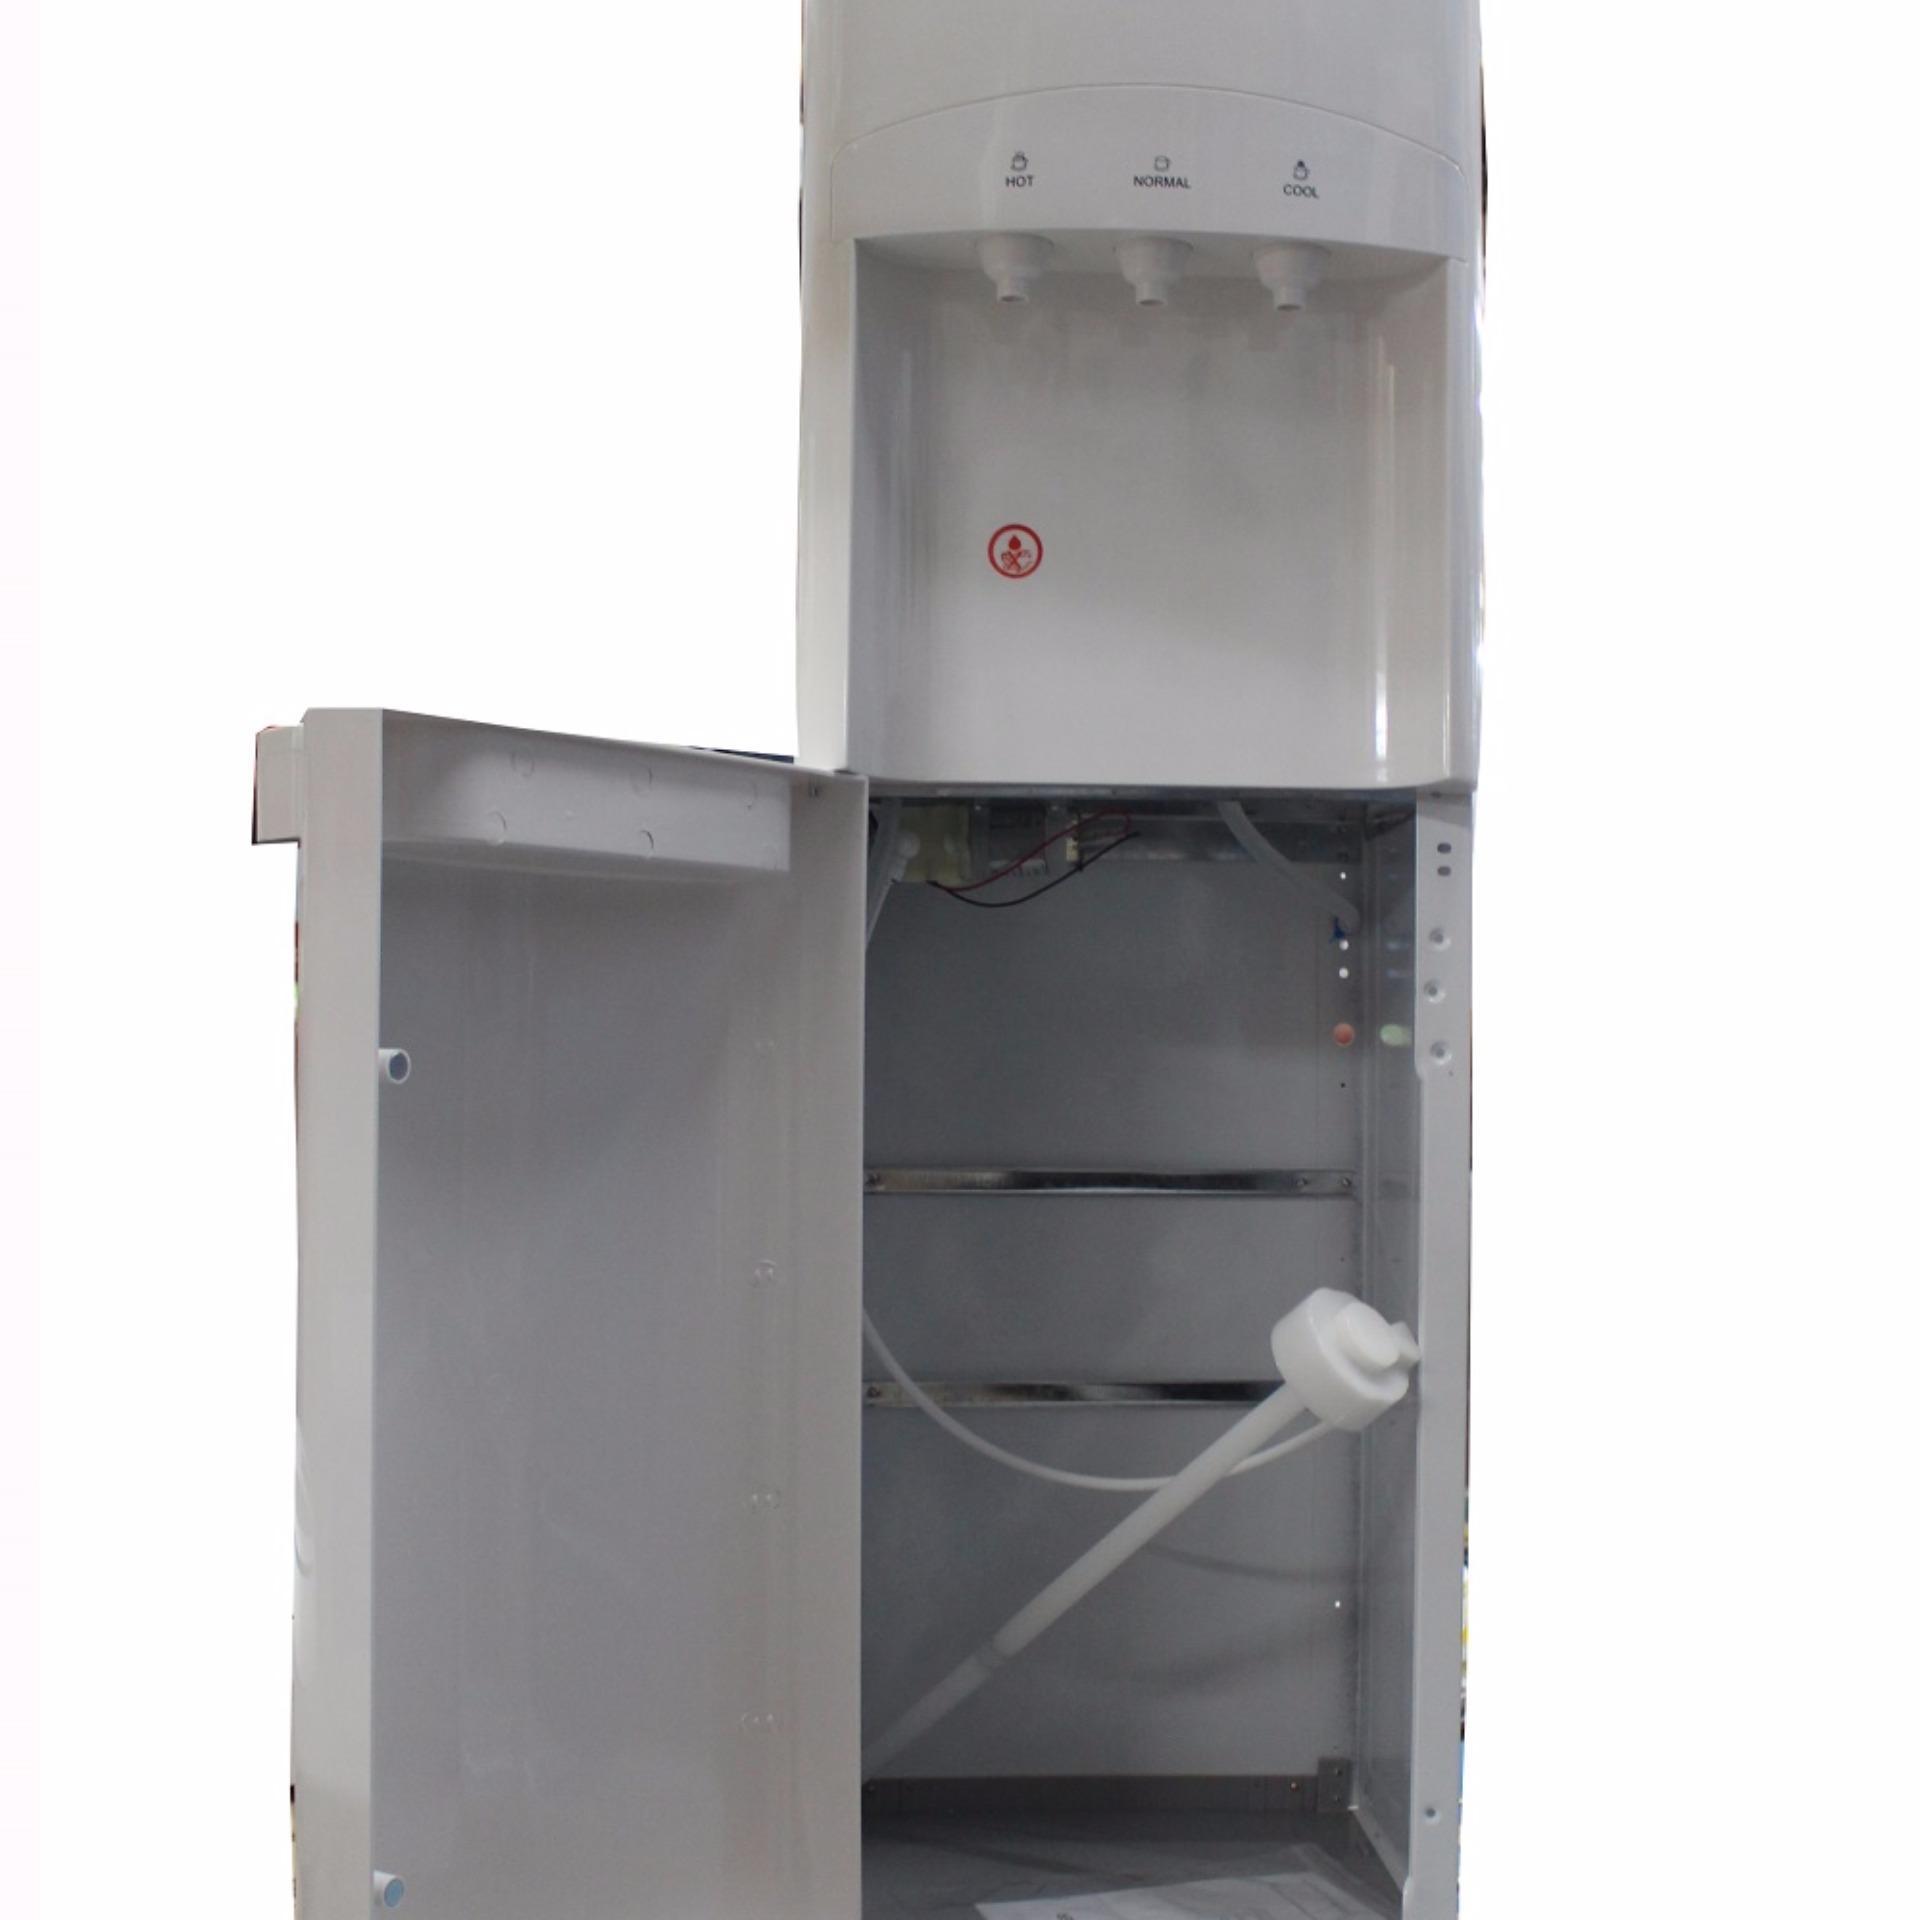 Denpoo DDB-29 Dispenser Galon Bawah 3 Kran - KHUSUS JABODETABEK ...